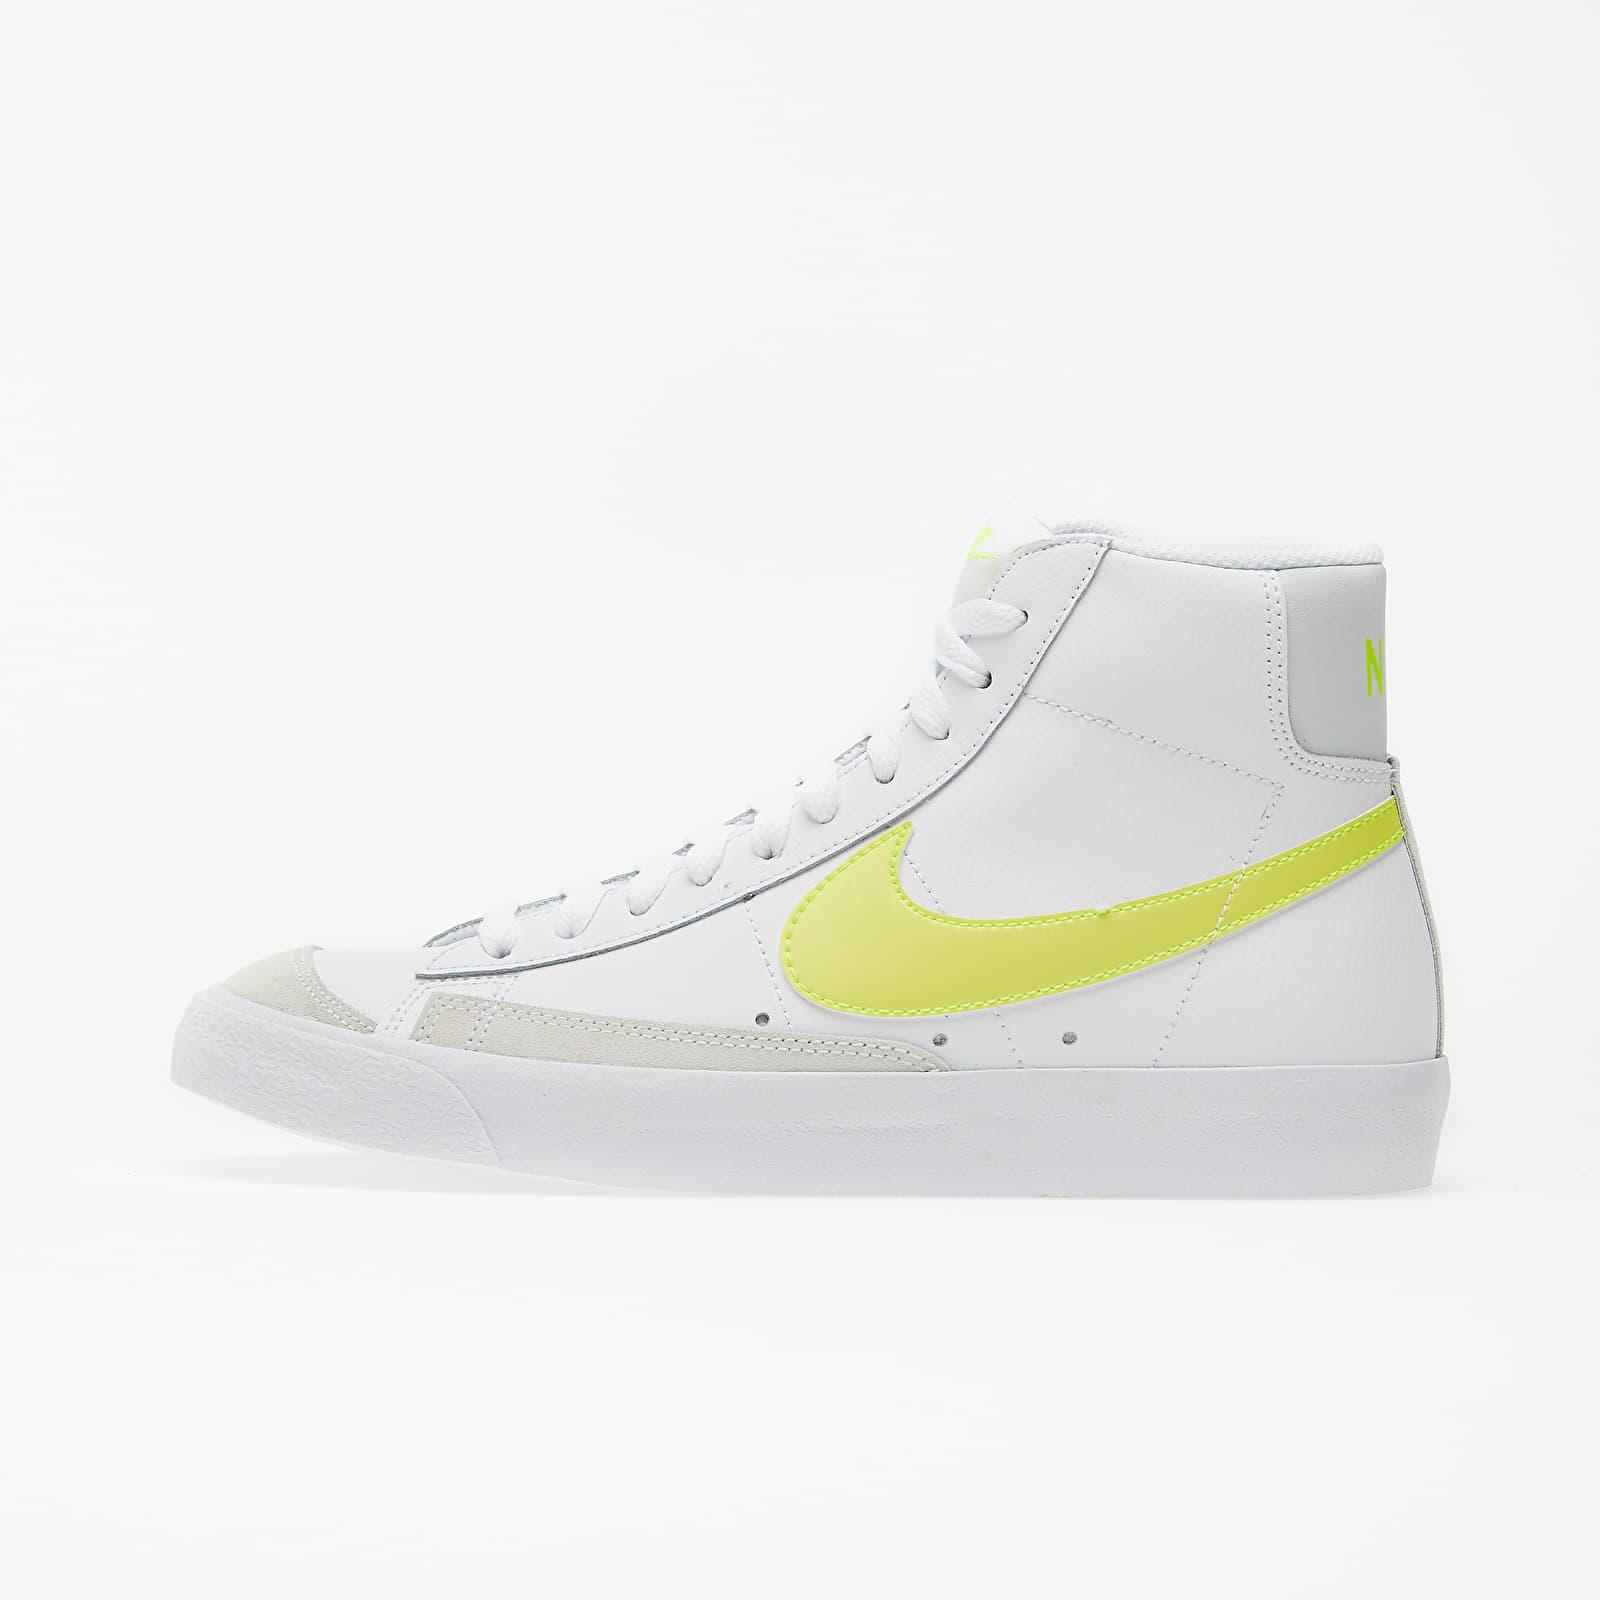 Women's shoes Nike Wmns Blazer Mid '77 White/ Lemon Venom